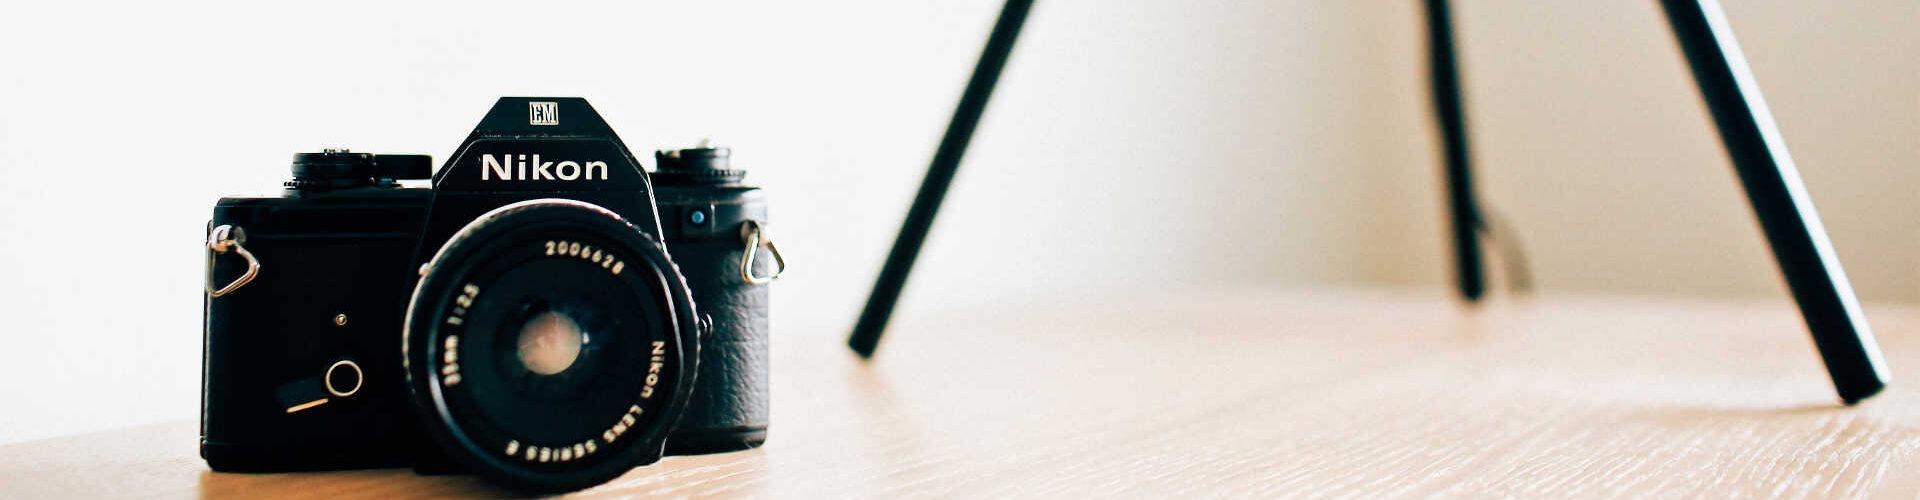 Nikon: creative social media content